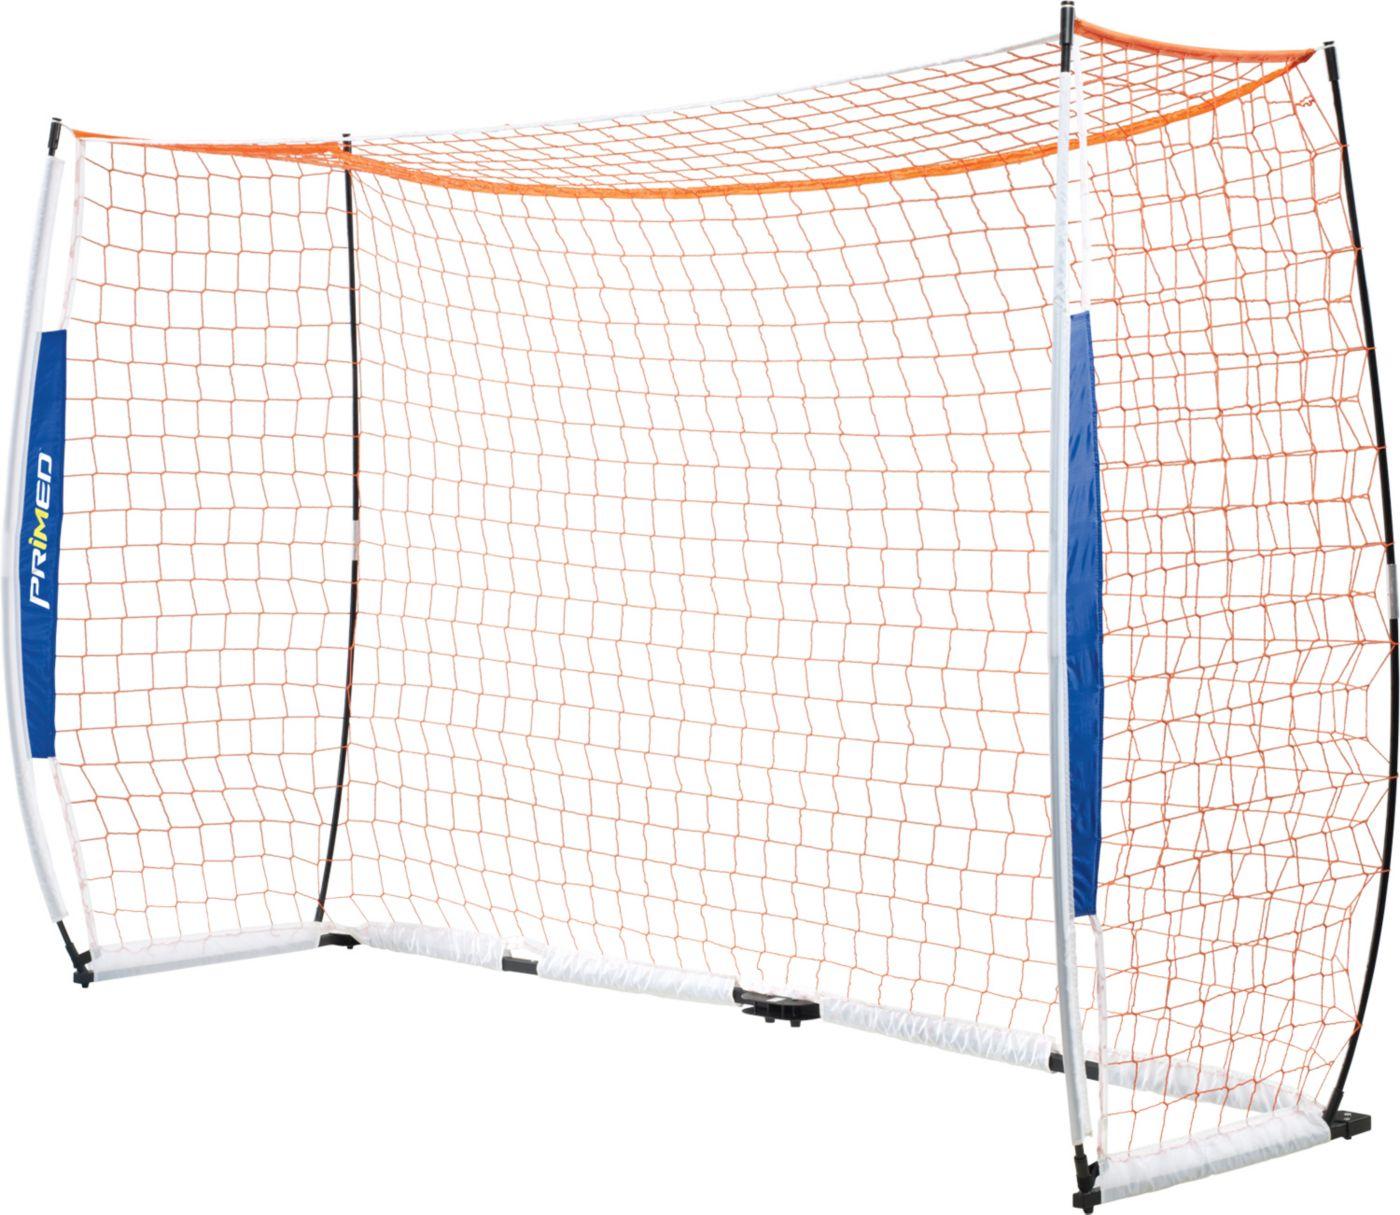 PRIMED 3m x 2m Instant Futsal Goal